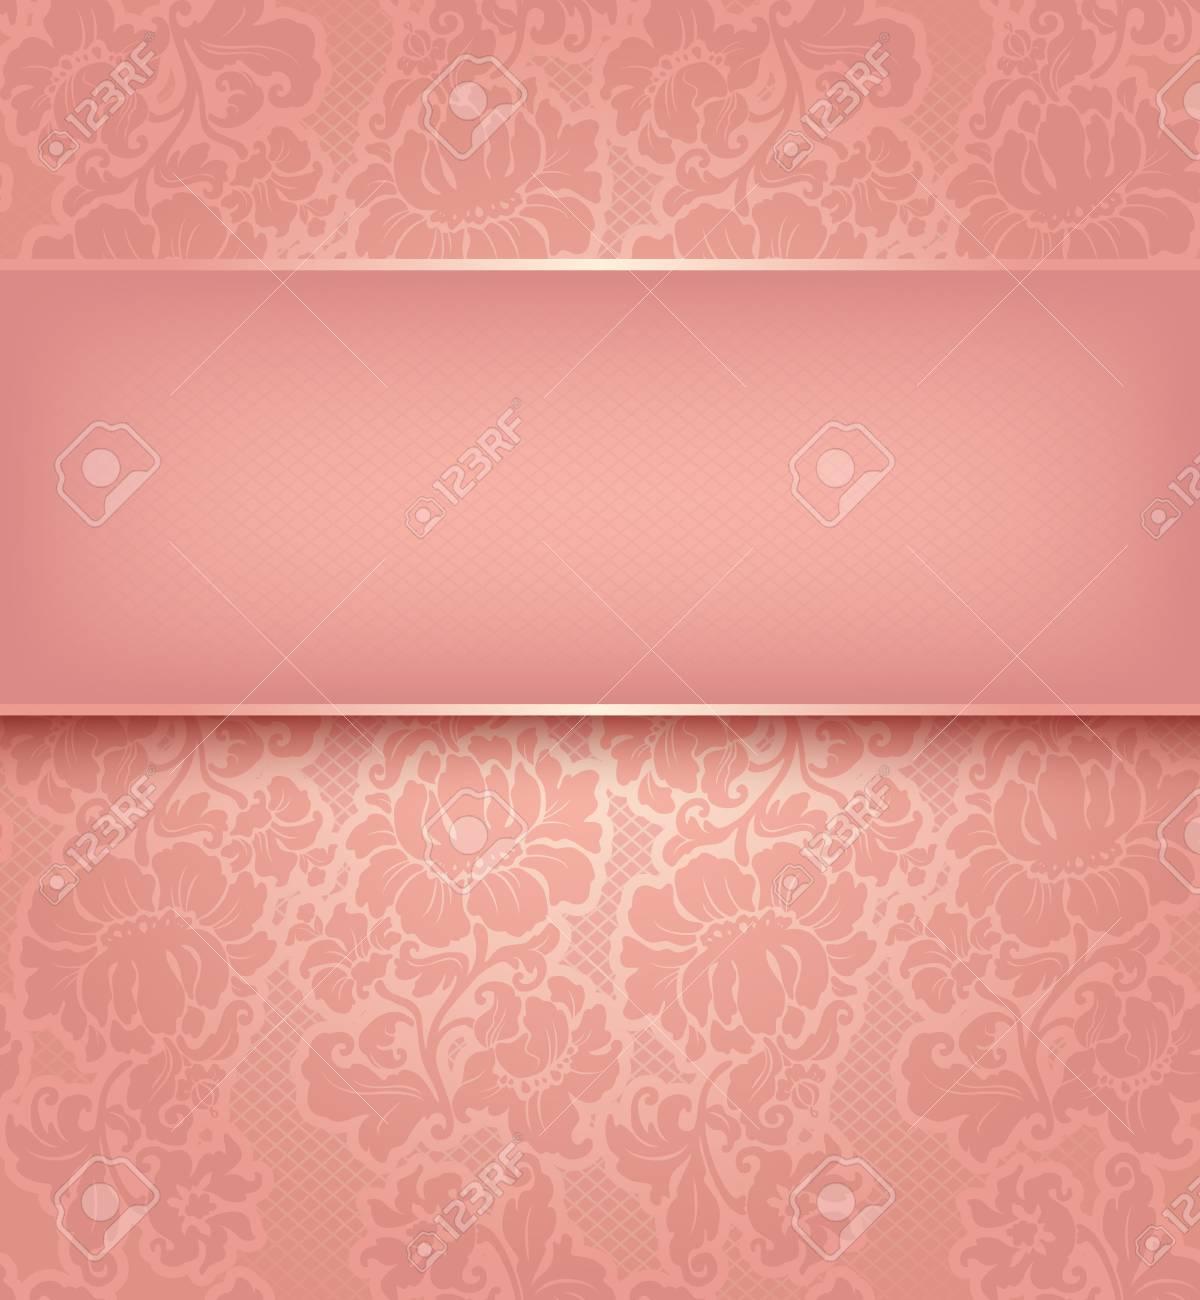 Decorative pink pattern - Vector illustration 10eps Stock Vector - 17115938